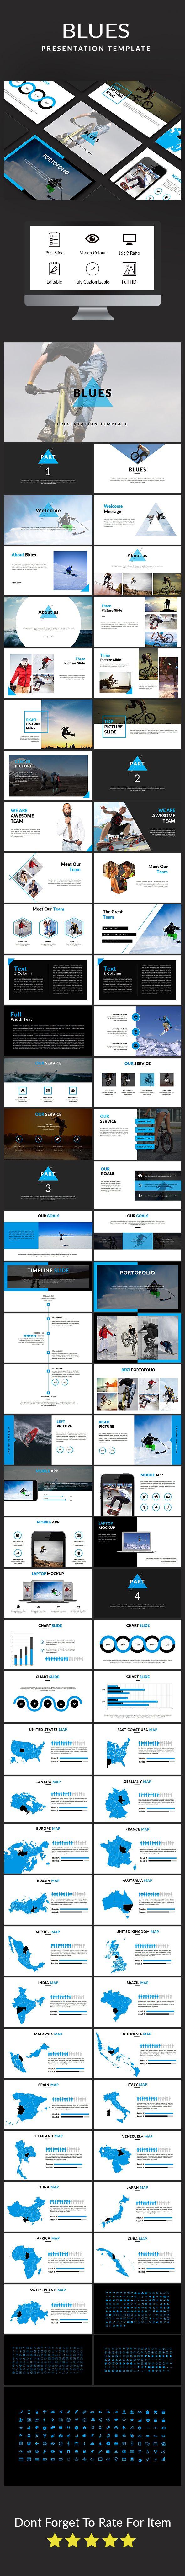 hotel powerpoint presentation templates choice image - templates, Modern powerpoint